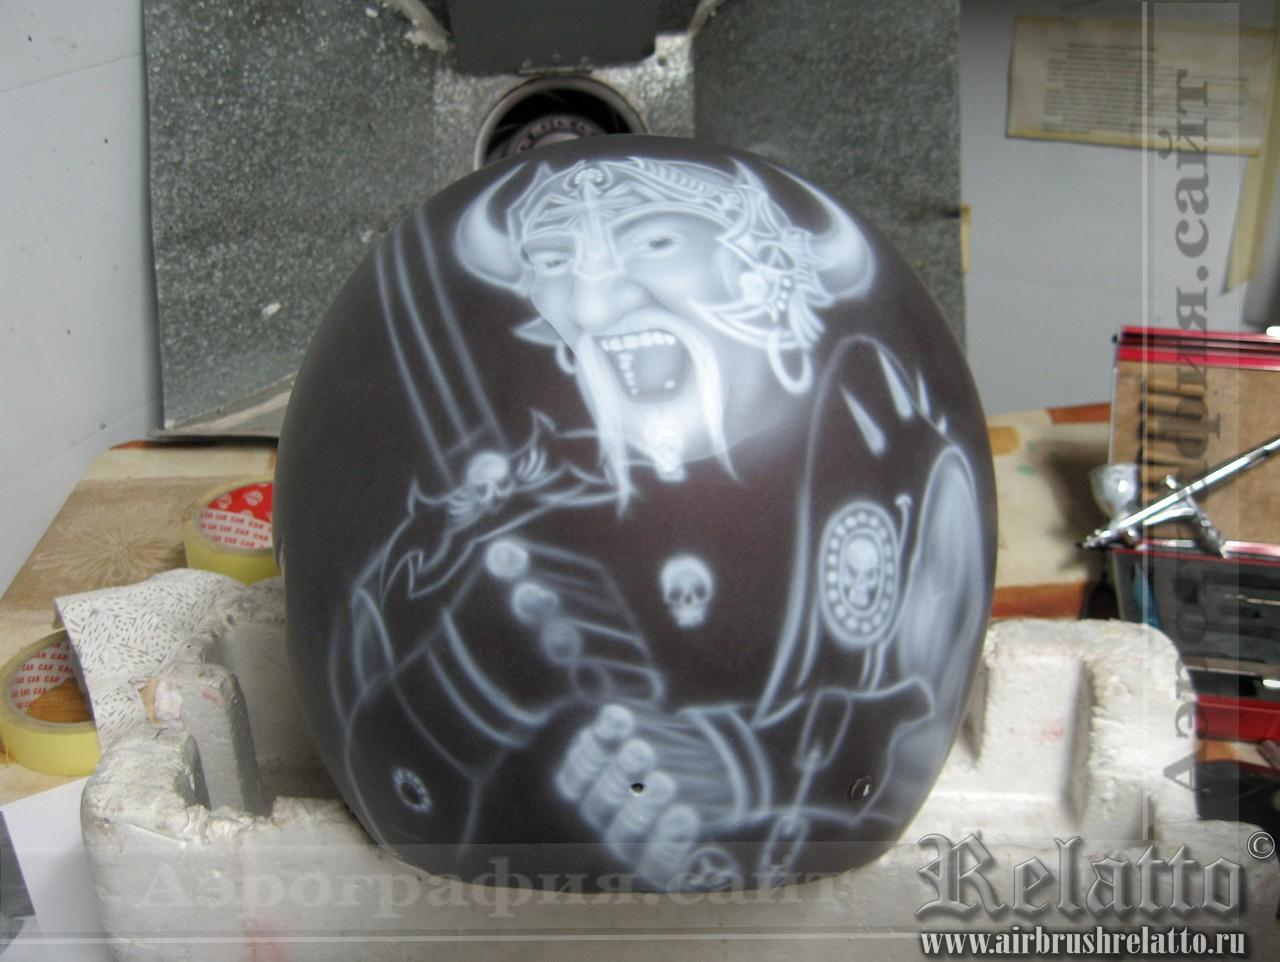 Аэрография шлема Harley Davidson процесс